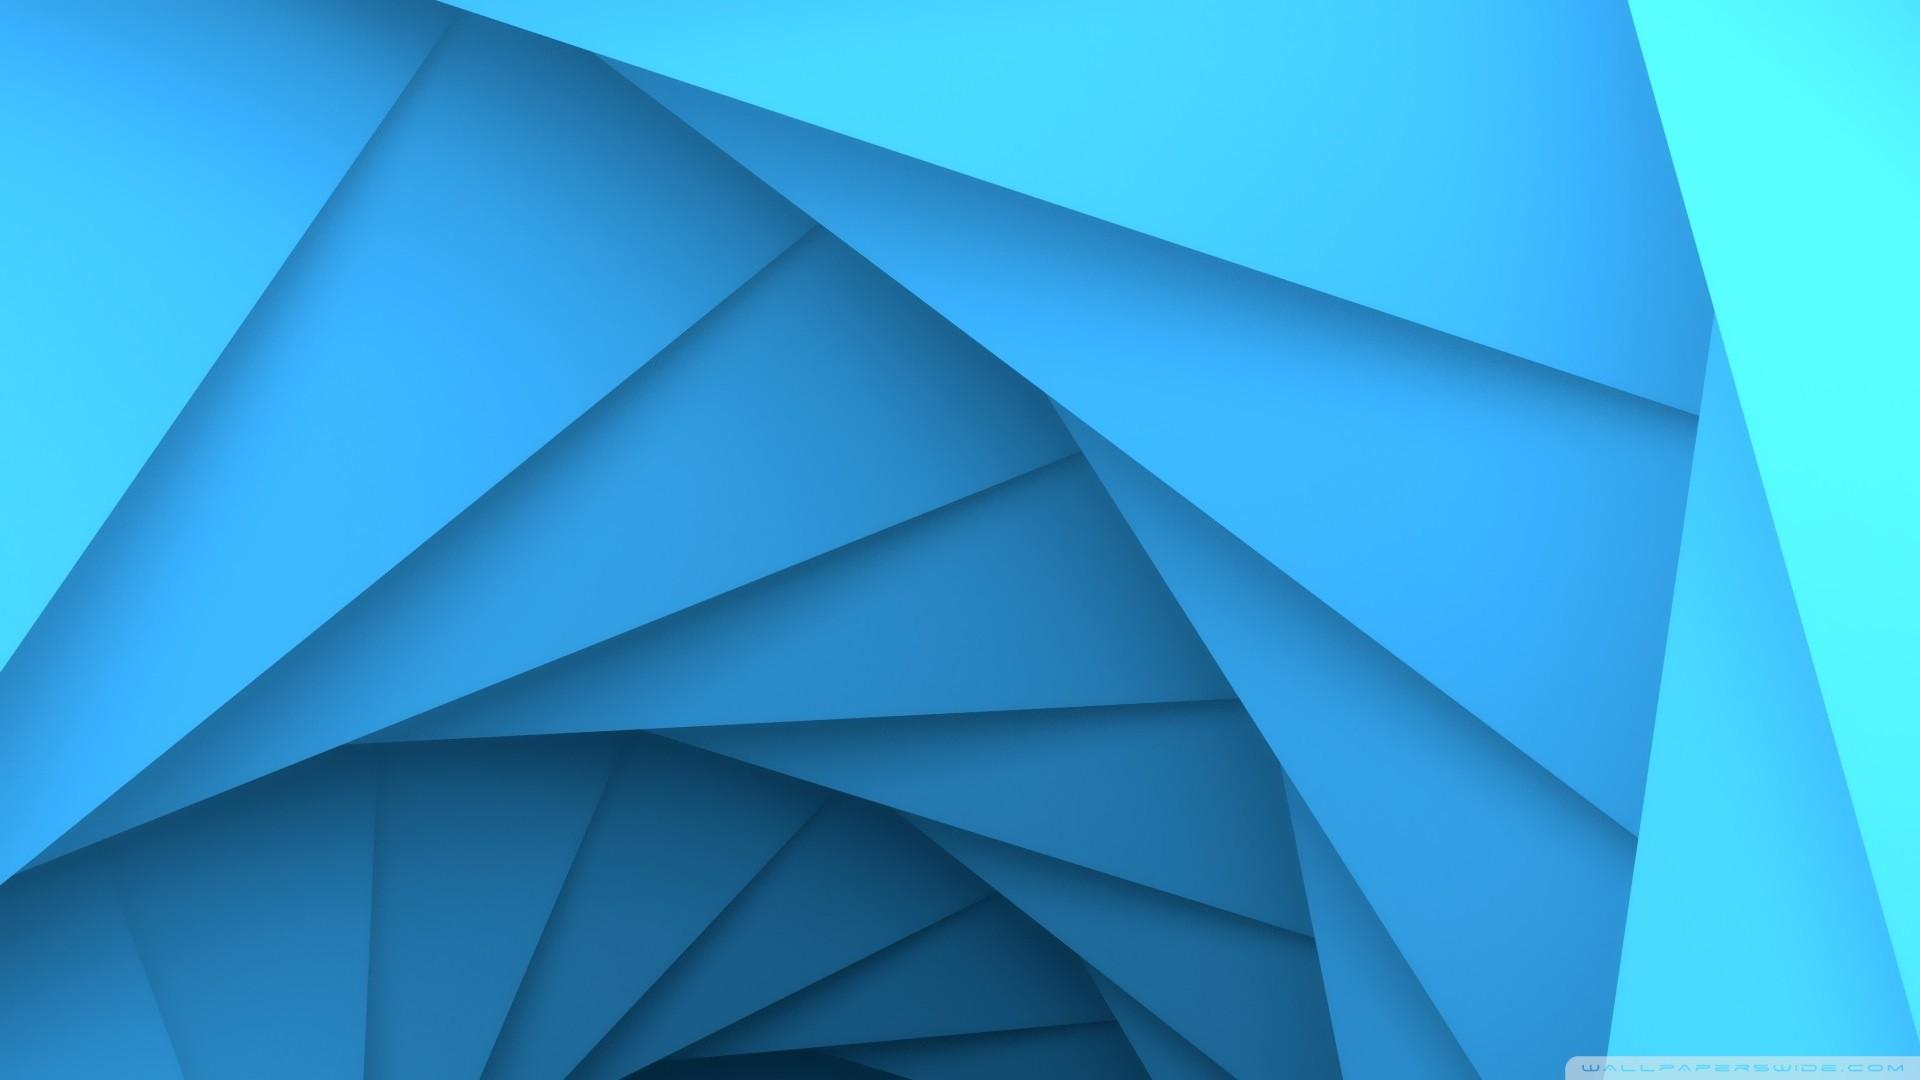 … geometry dash v2 blue hd desktop wallpaper widescreen …